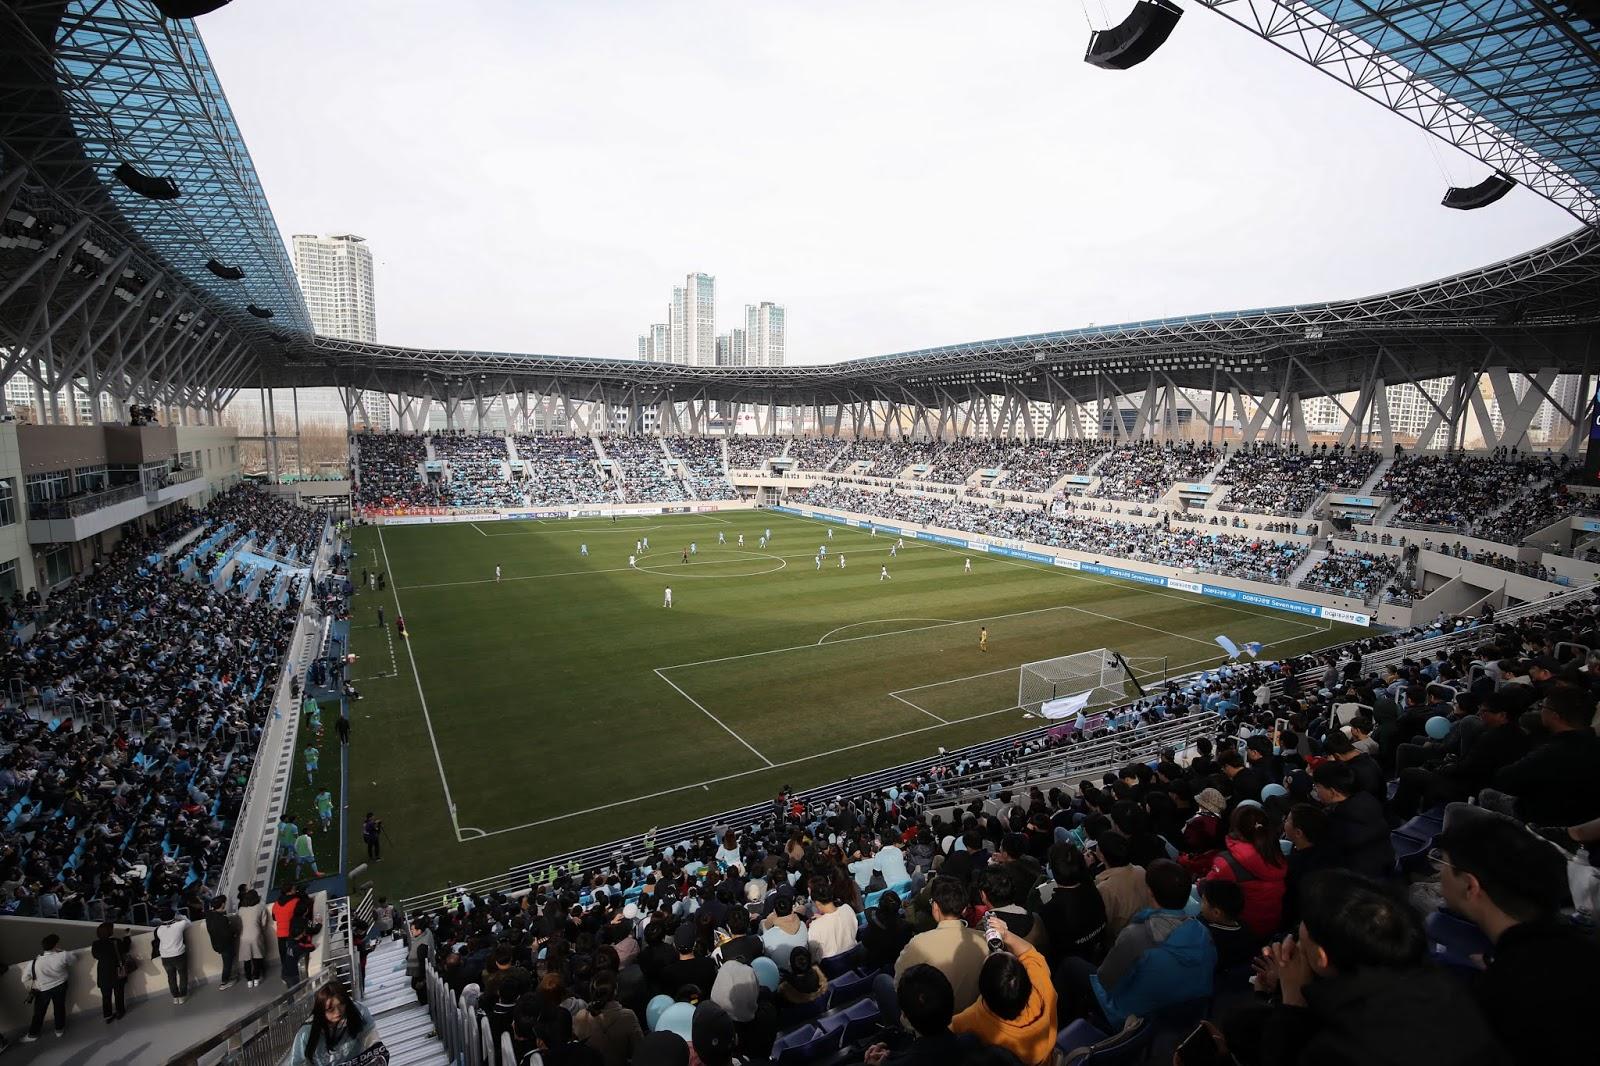 DGB Daegu Bank Park Nominated for Stadium Award